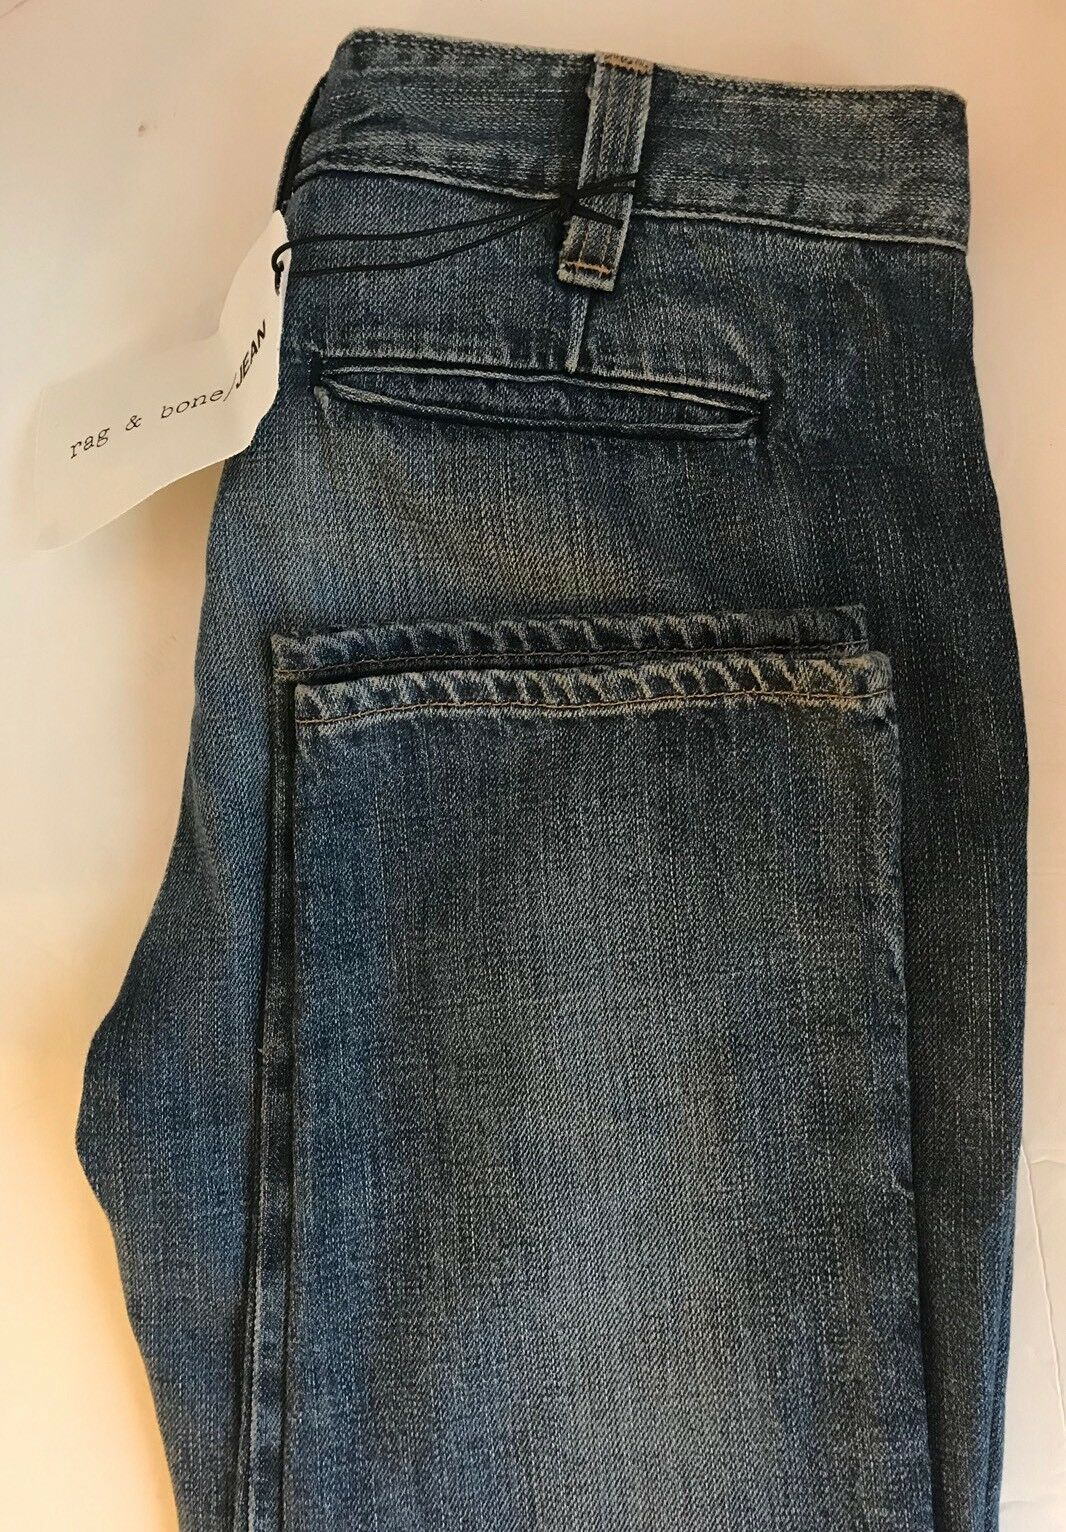 New Rag & Bone Women Jeans Denim Stone Wash 26 Straight Cotton USA Trouser Cut